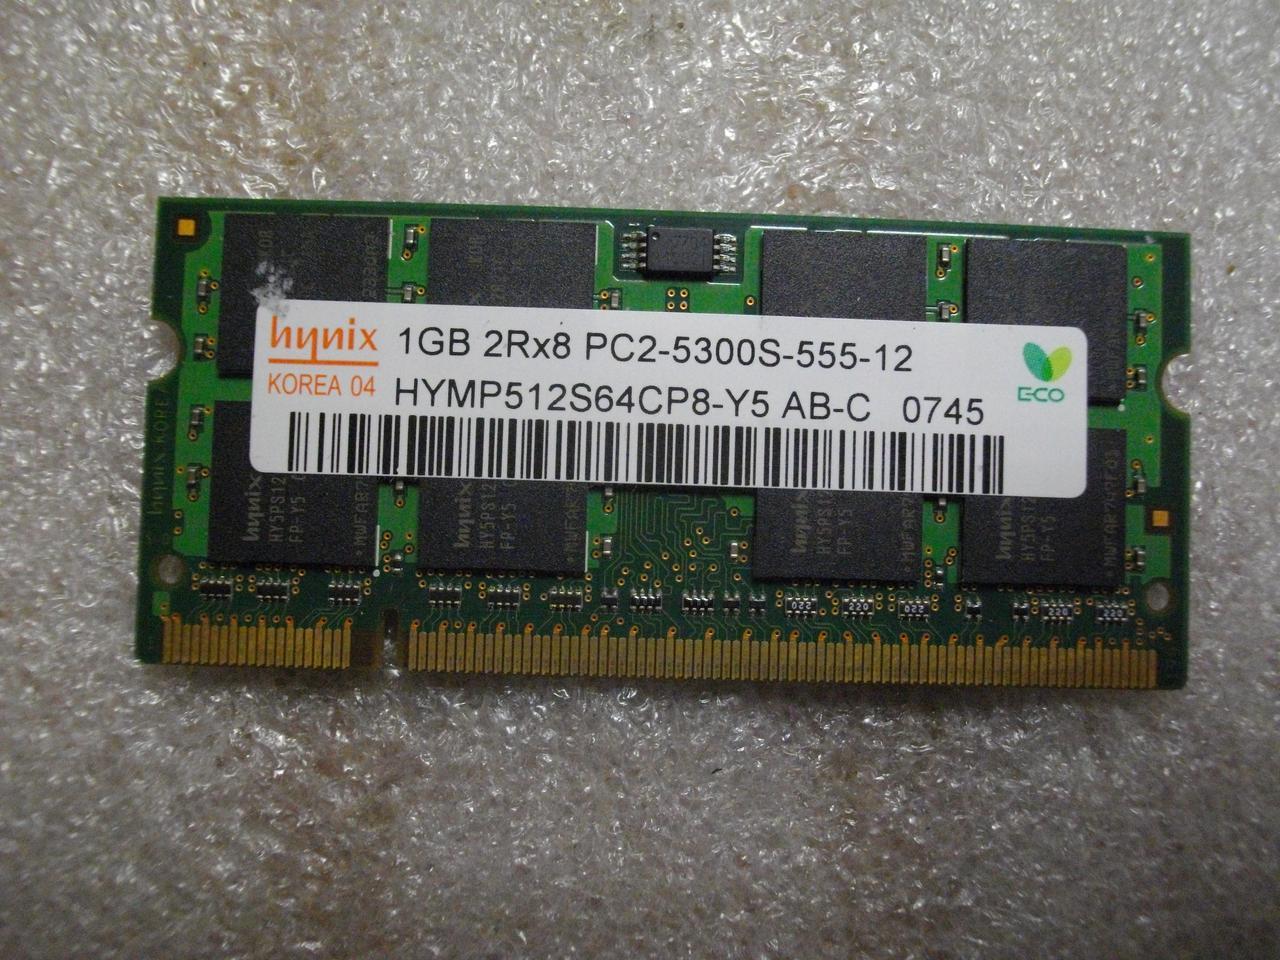 SODIMM DDR2 1GB оперативная память Hynix PC2-5300S-555-12, 2Rx8 для ноутбука бу.